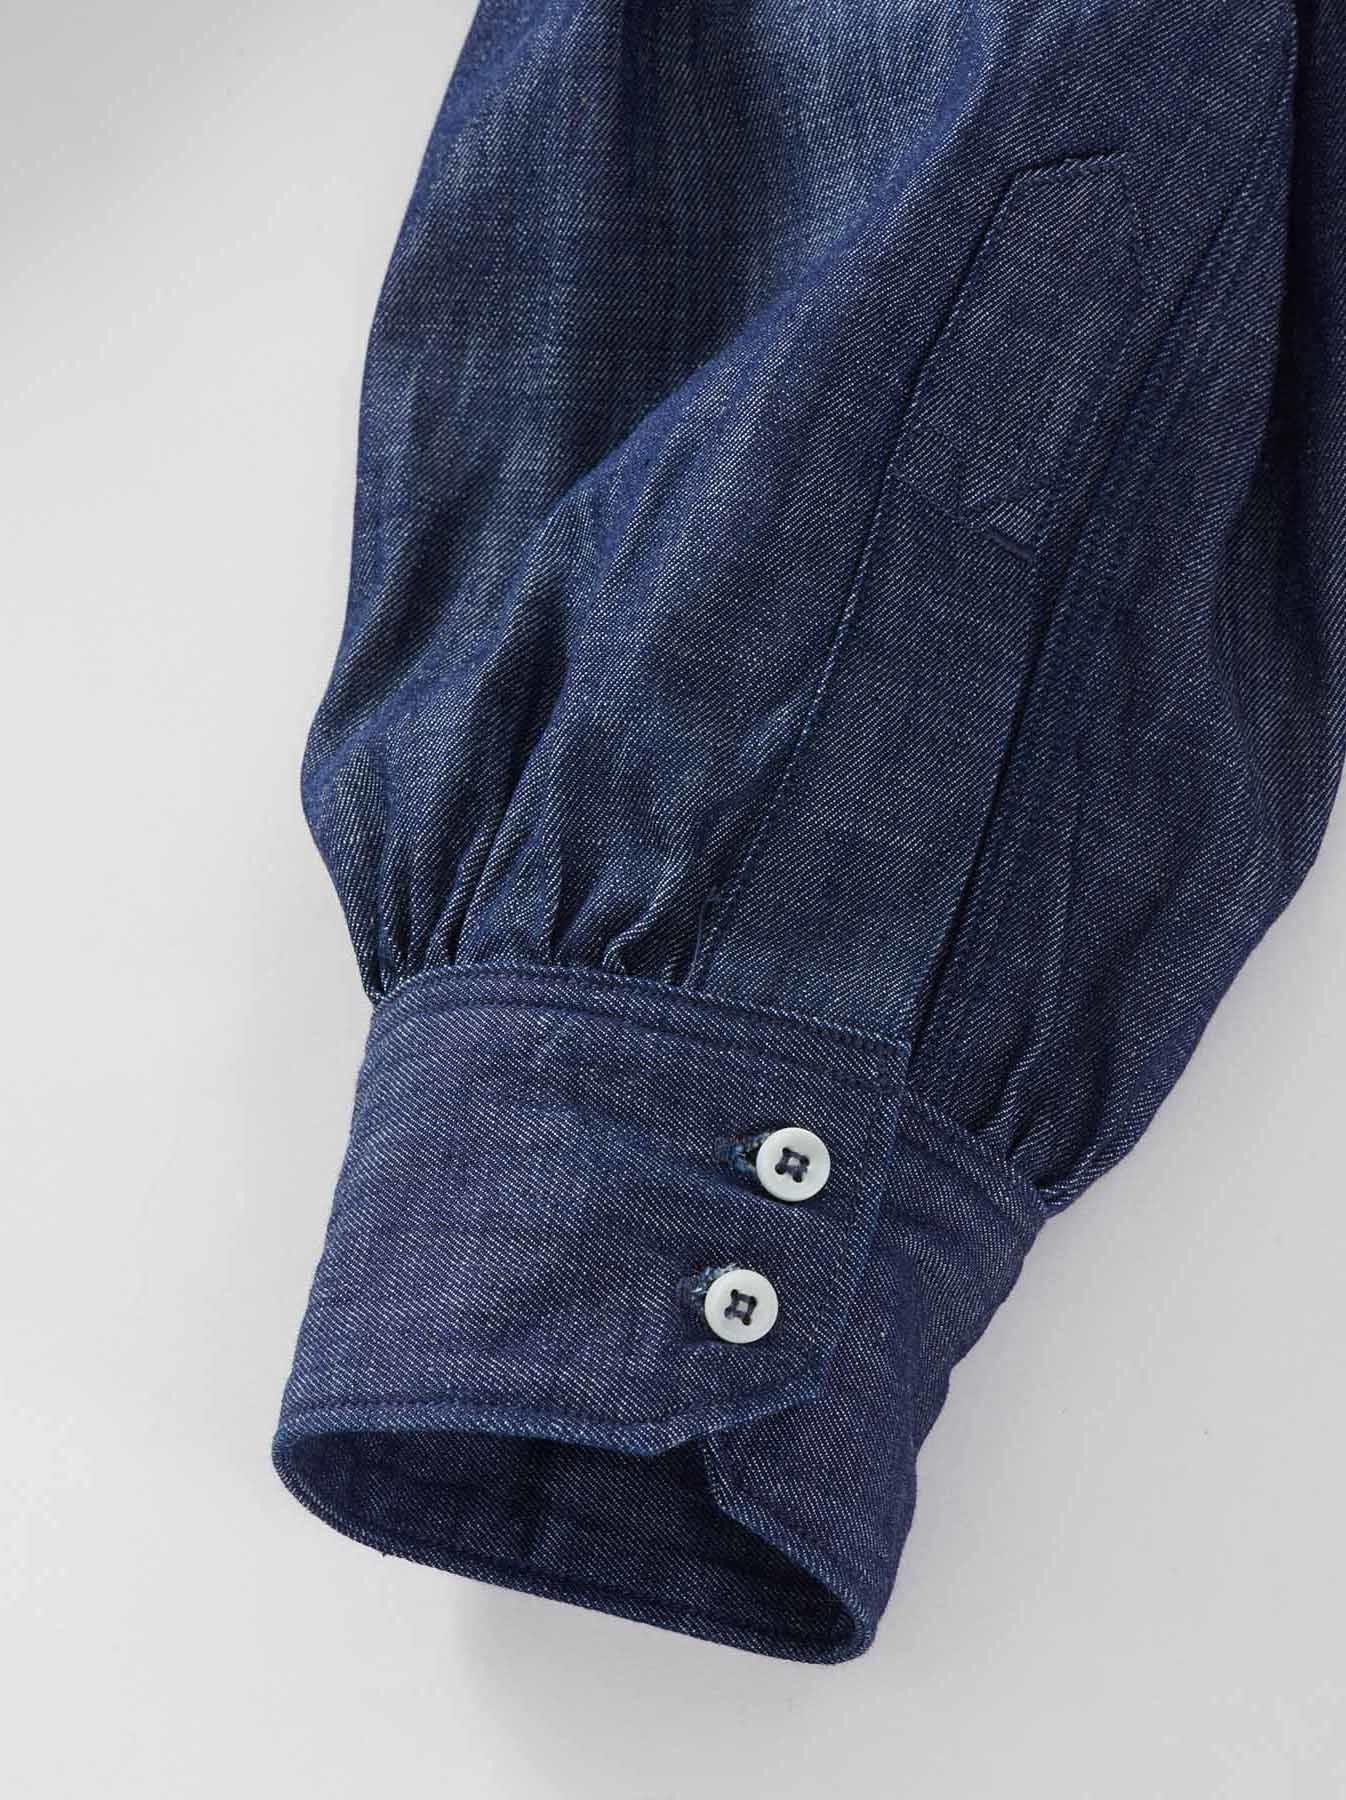 WH Goma Denim Umahiko Pullover Shirt-8